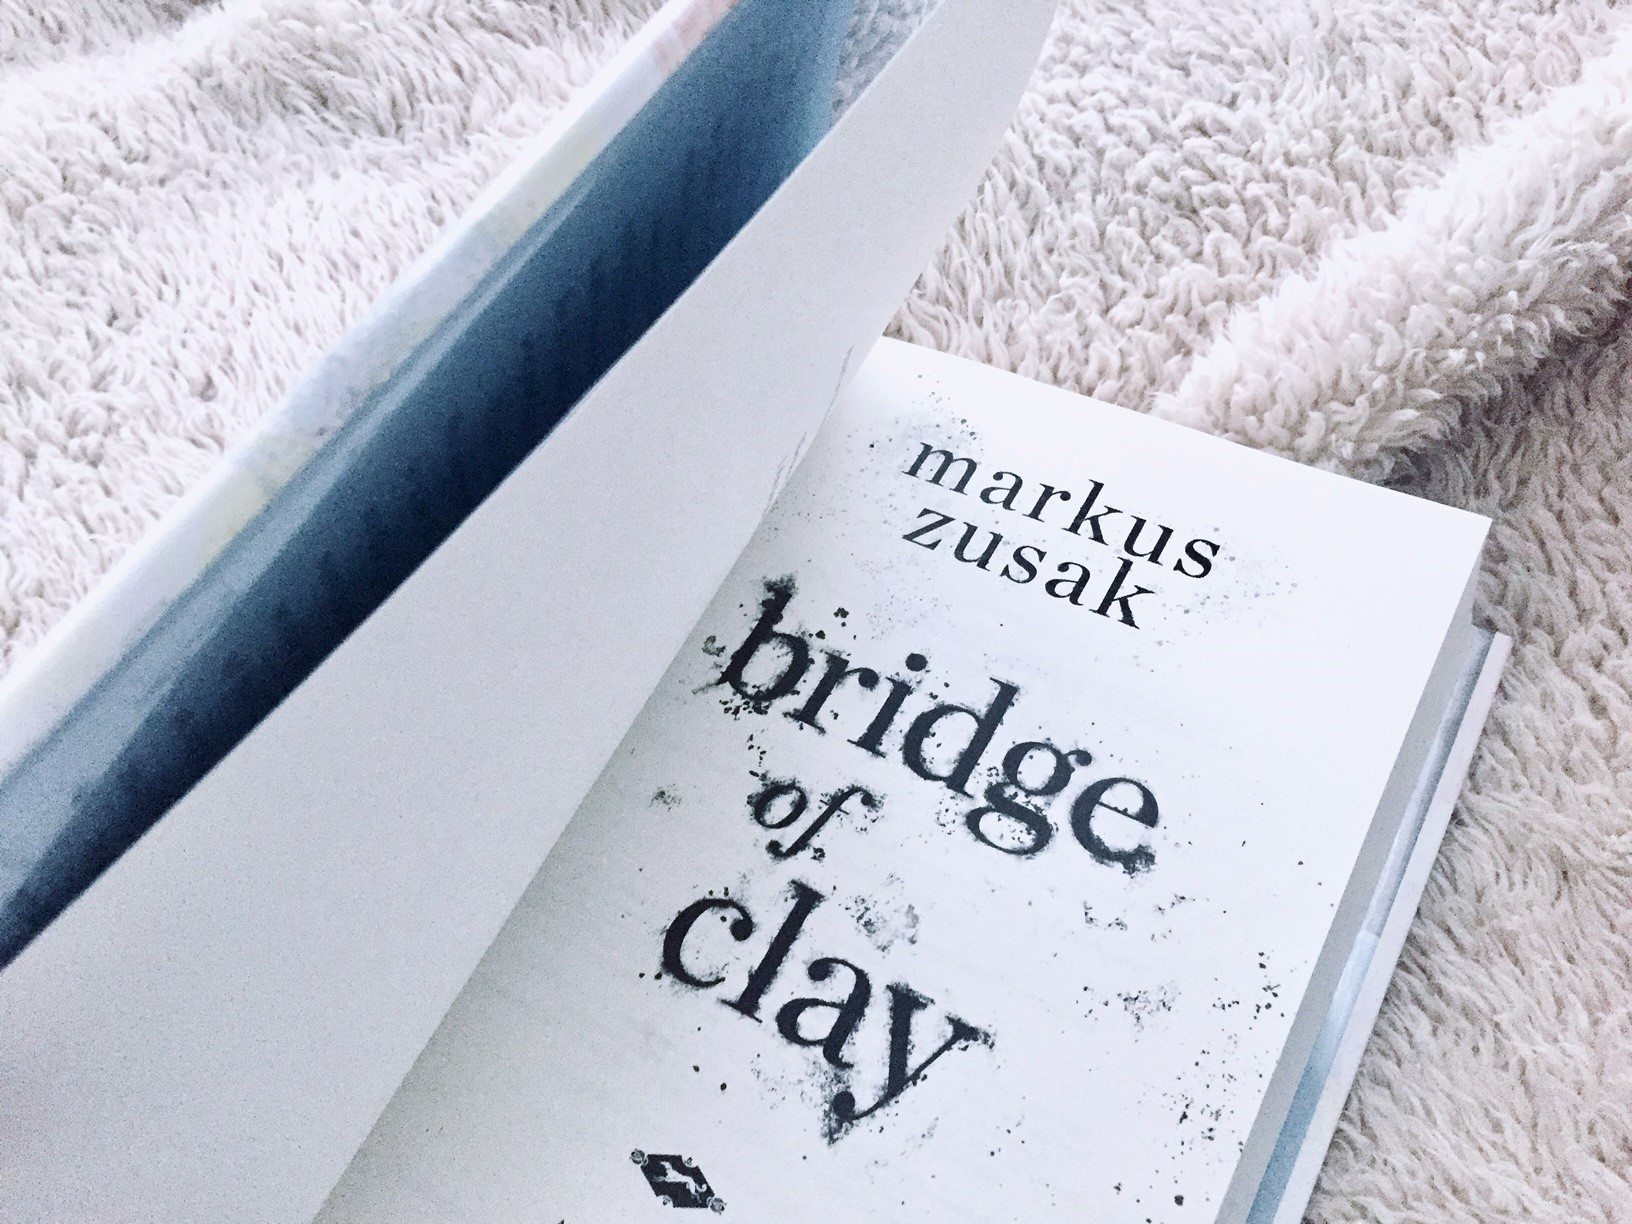 Bridge of Clay by Markus Zusak: Review on The Salt Compass Bookshelf